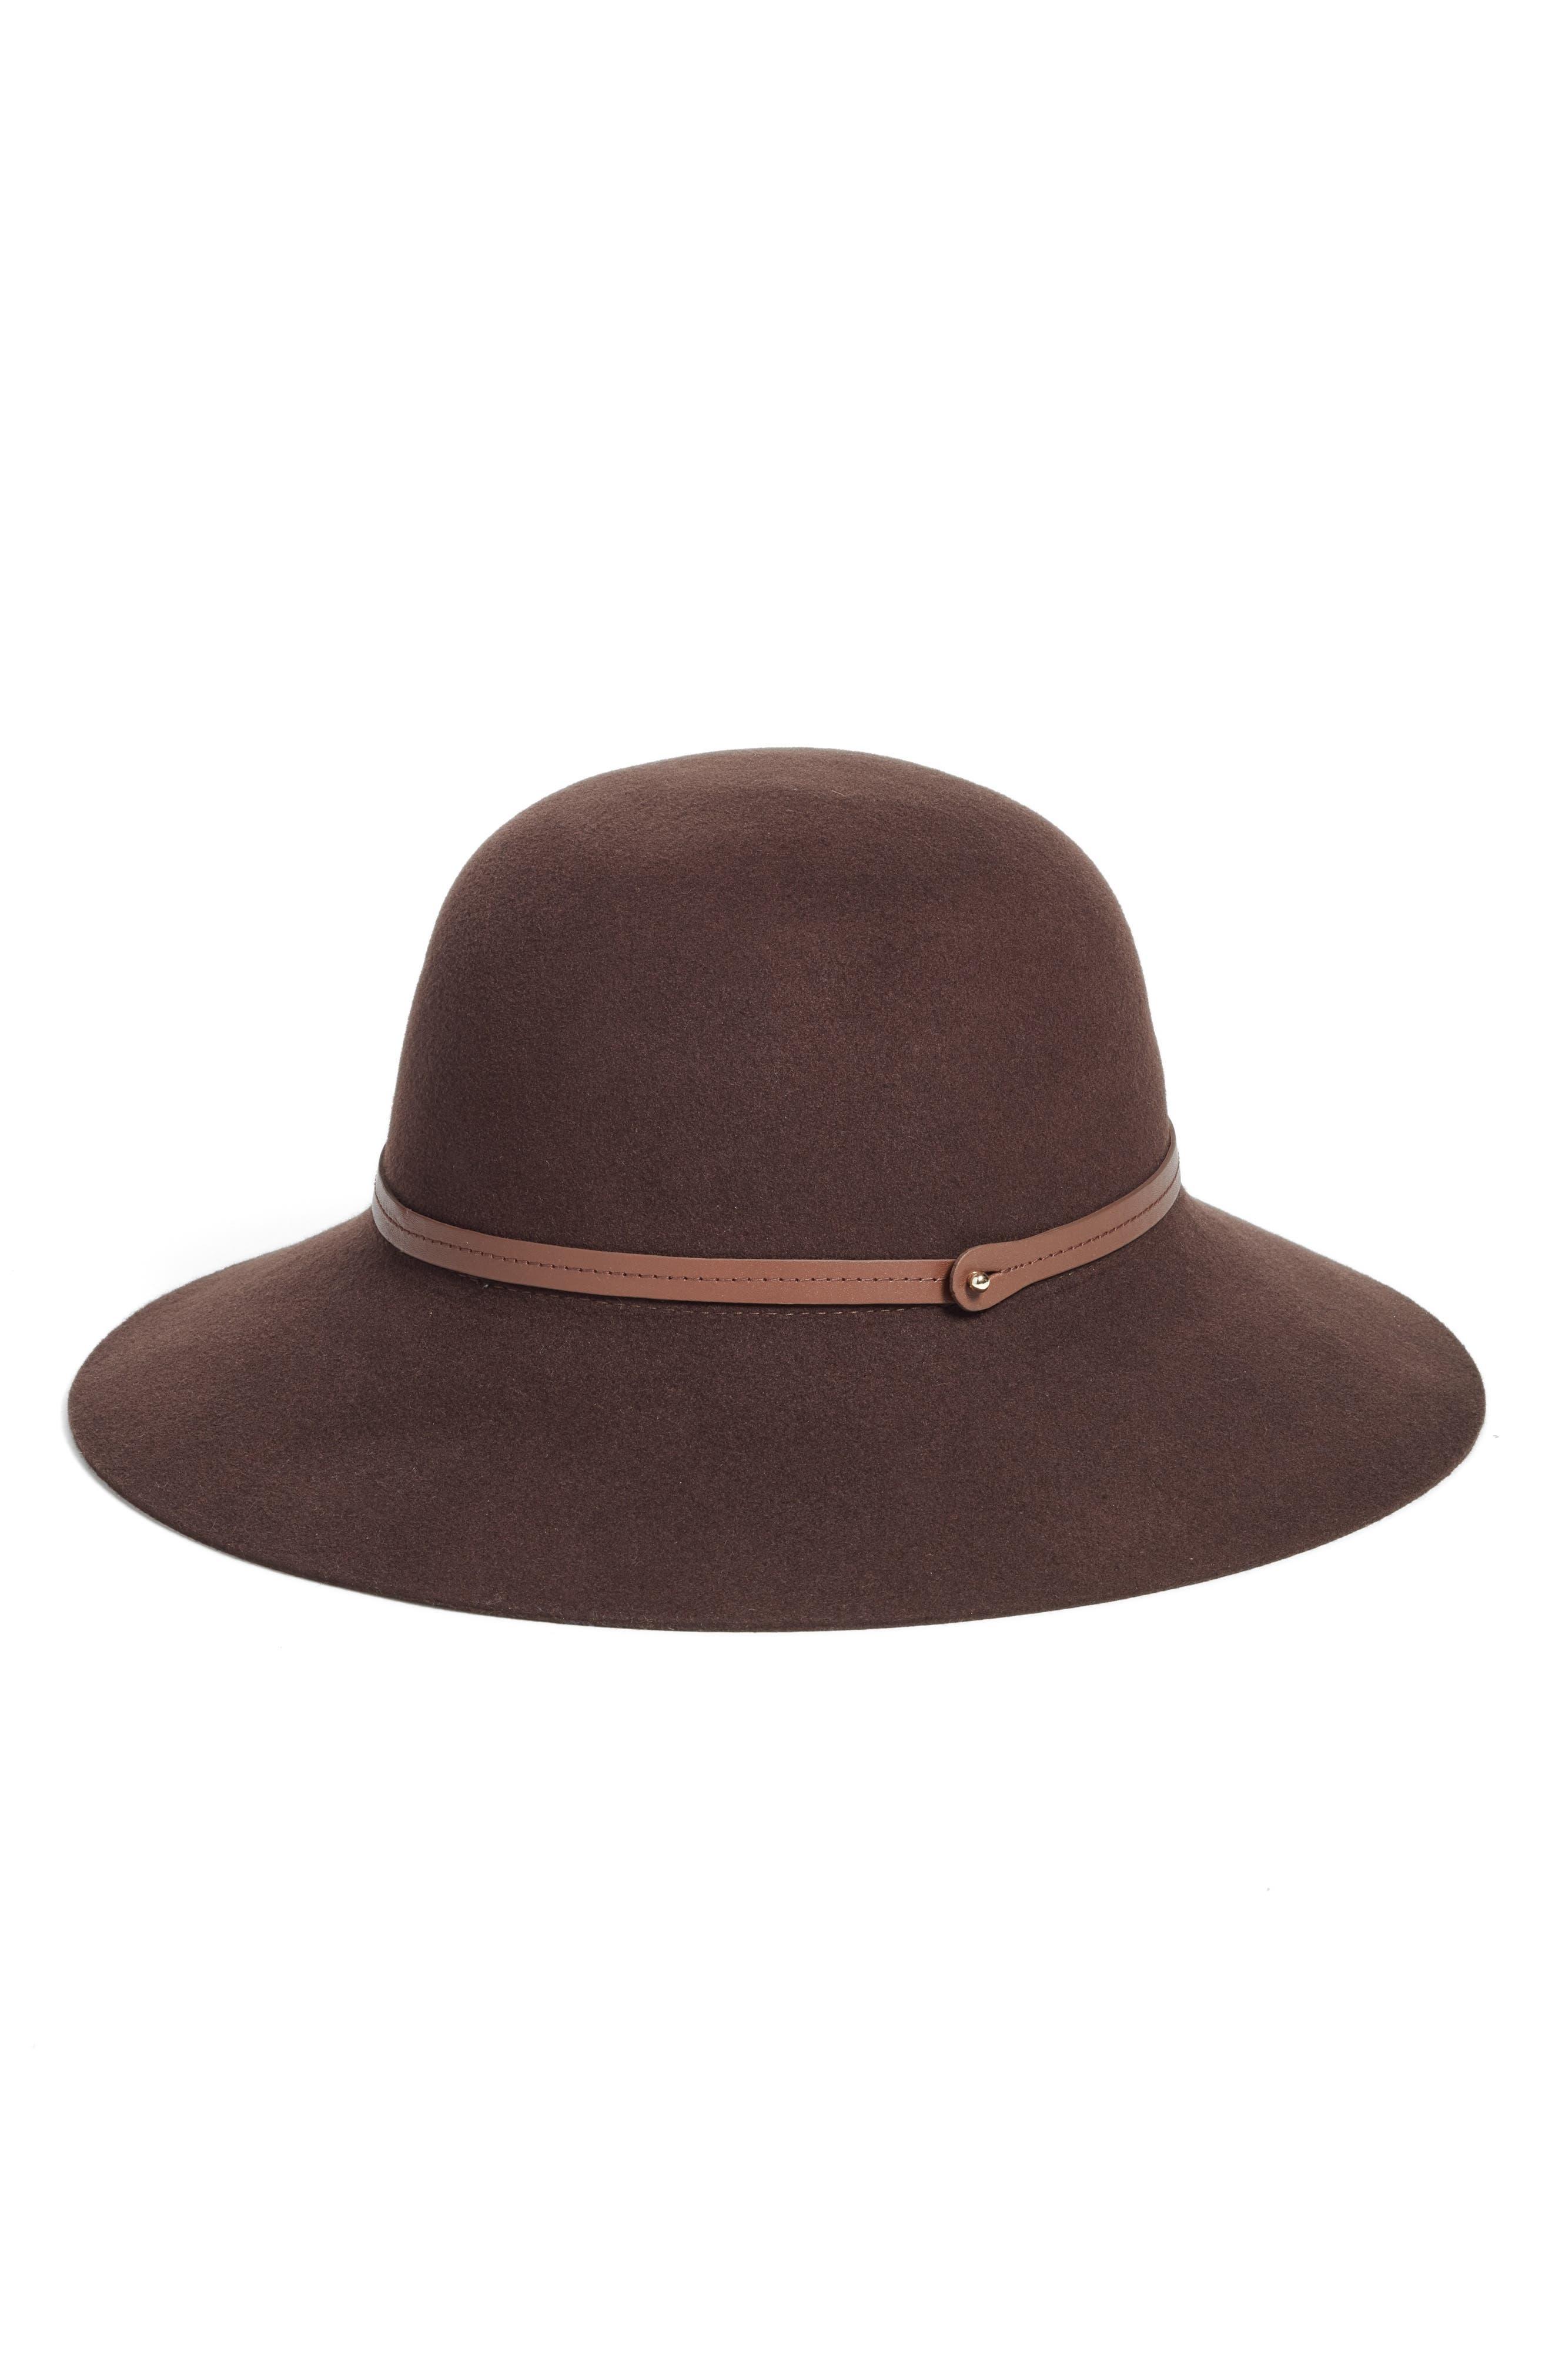 Alternate Image 2  - Helen Kaminski Angled Brim Wool Felt Hat